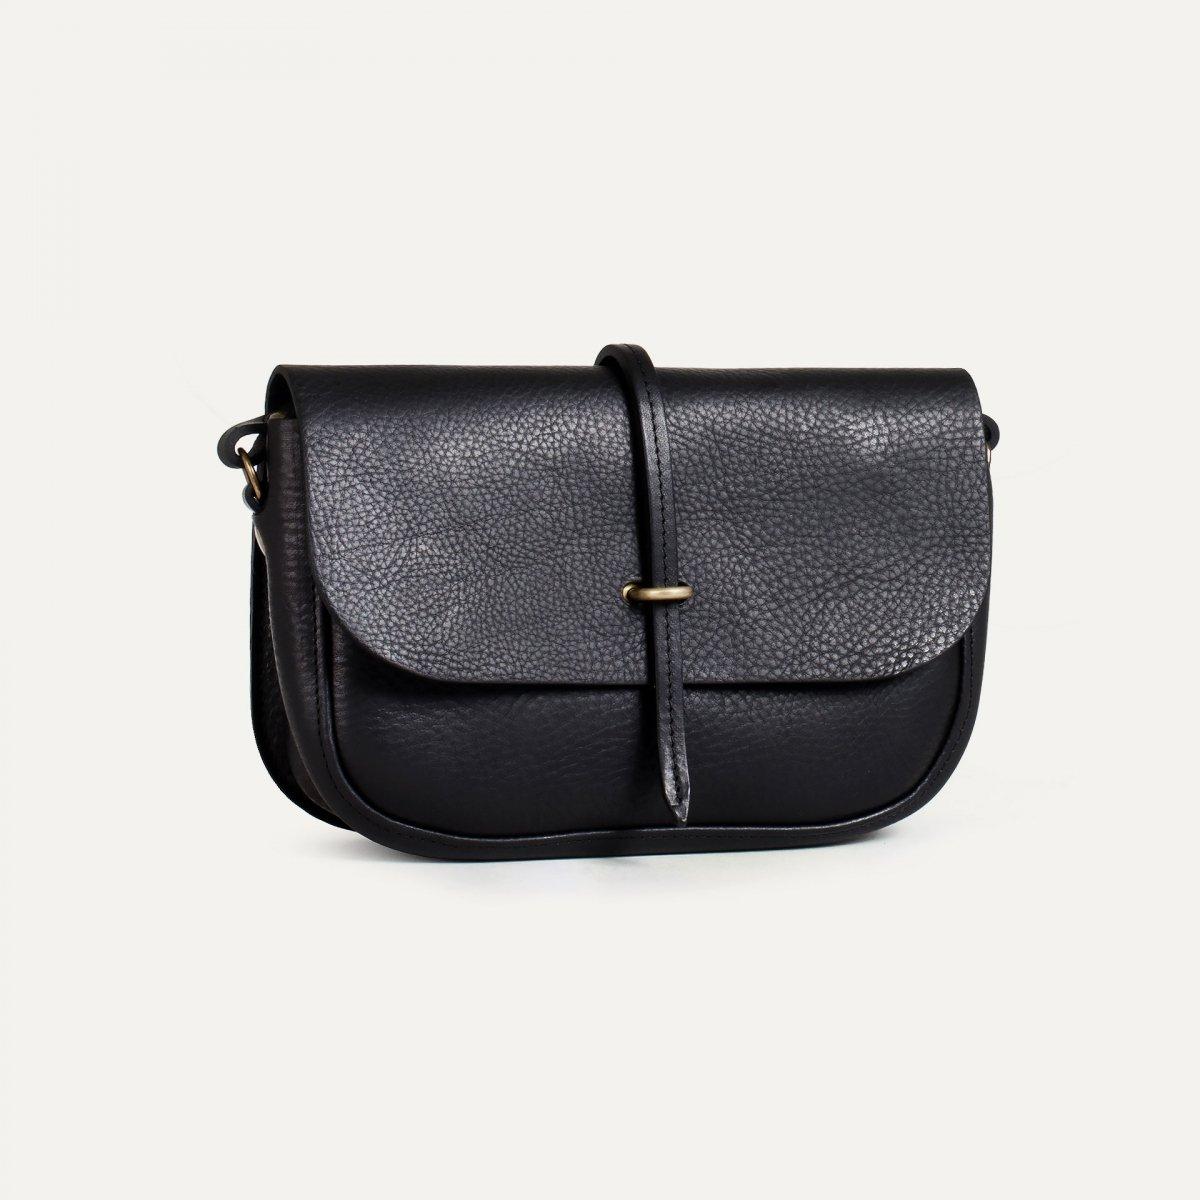 Pastis handbag - Black (image n°2)